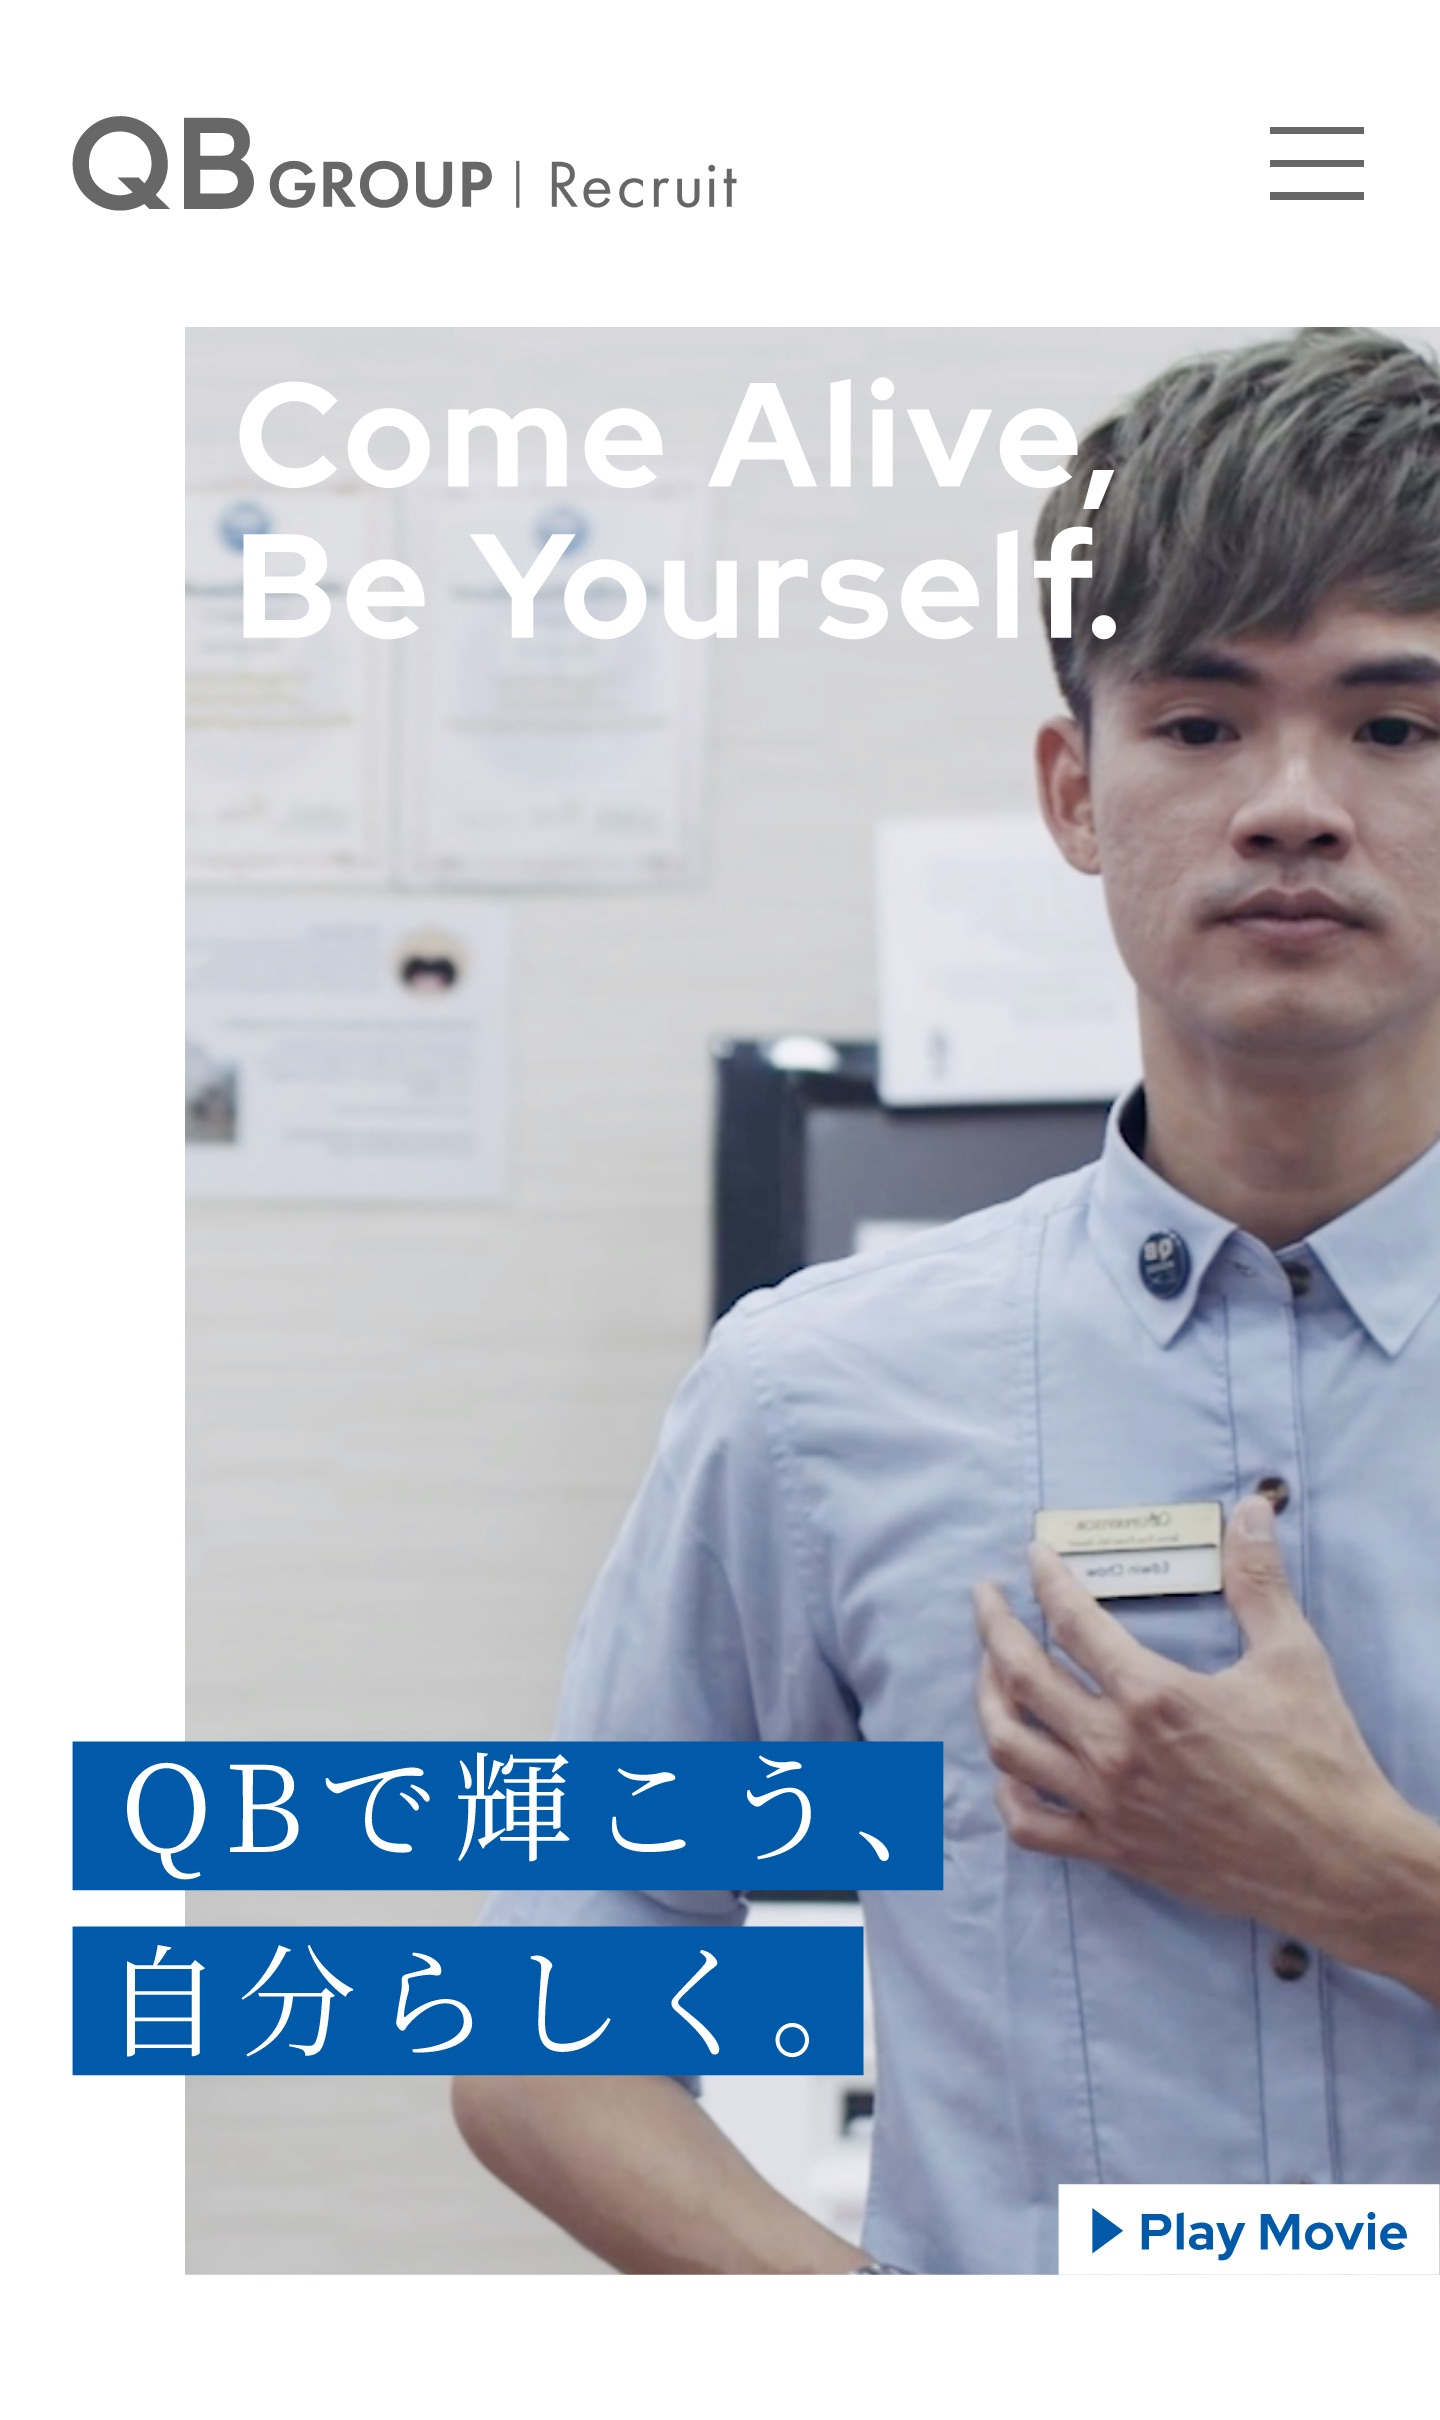 QB GROUP